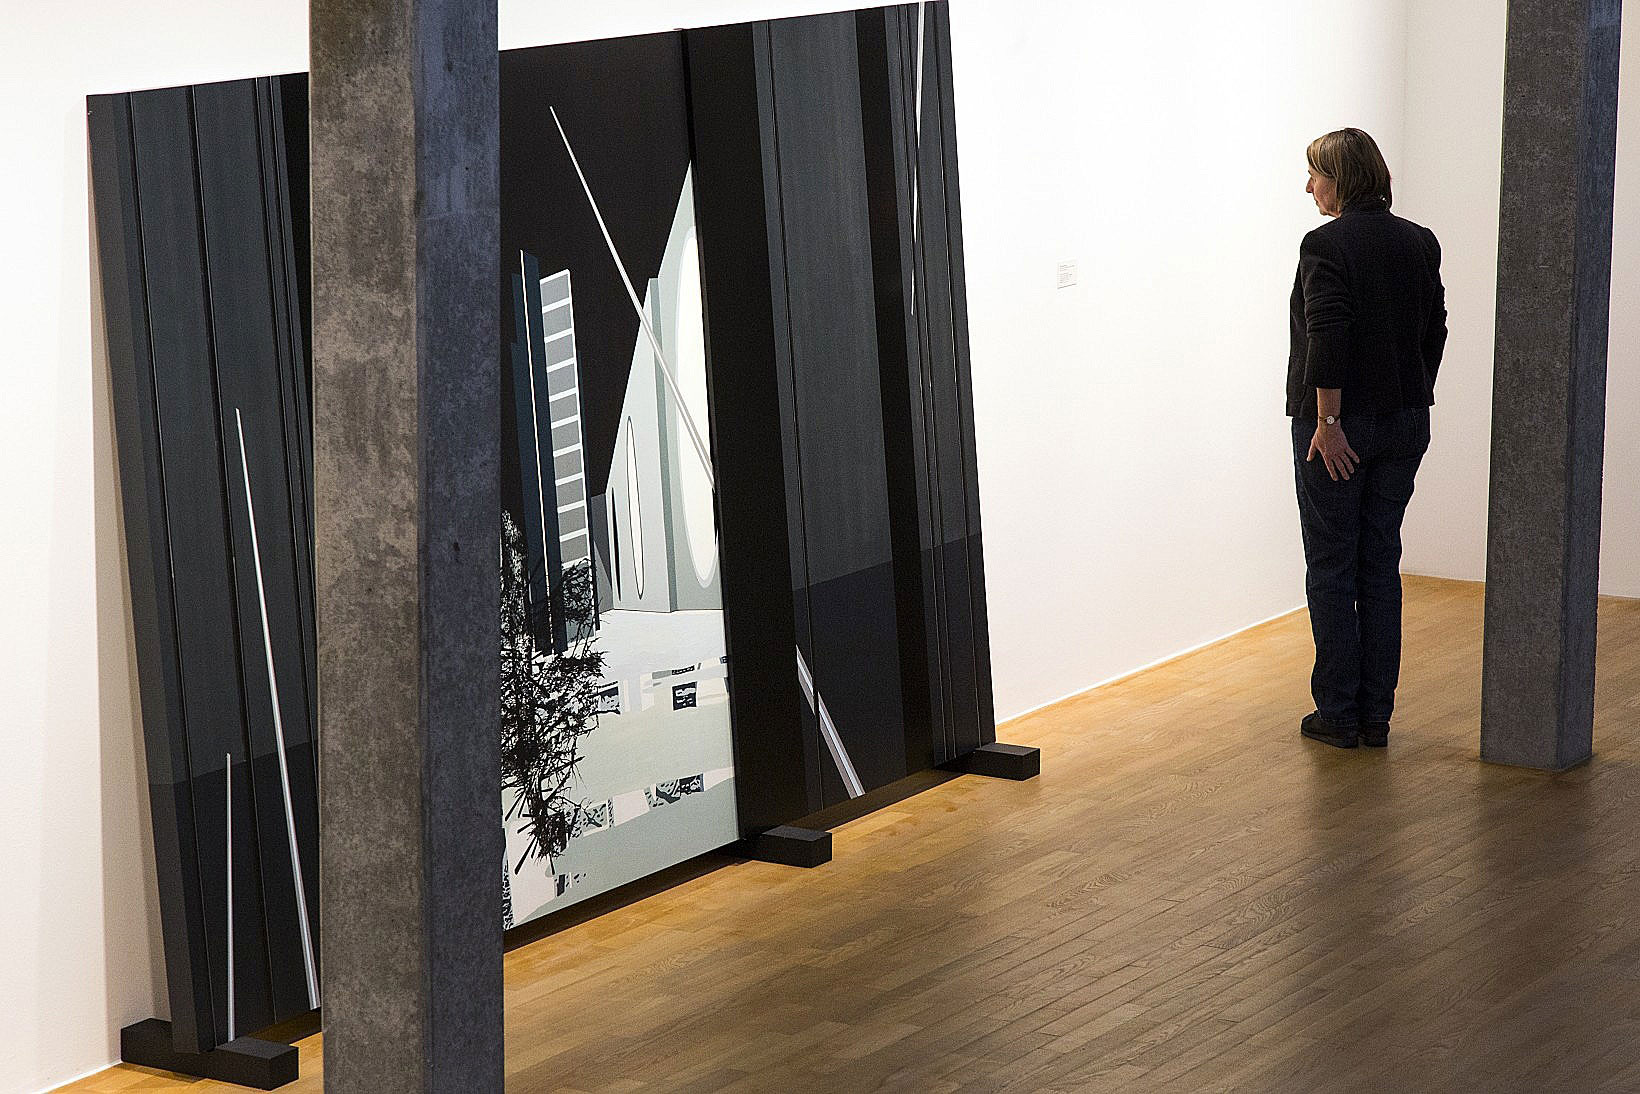 Lightboard gross  eur erco municipal gallery bietigheim bissingen image 1 5